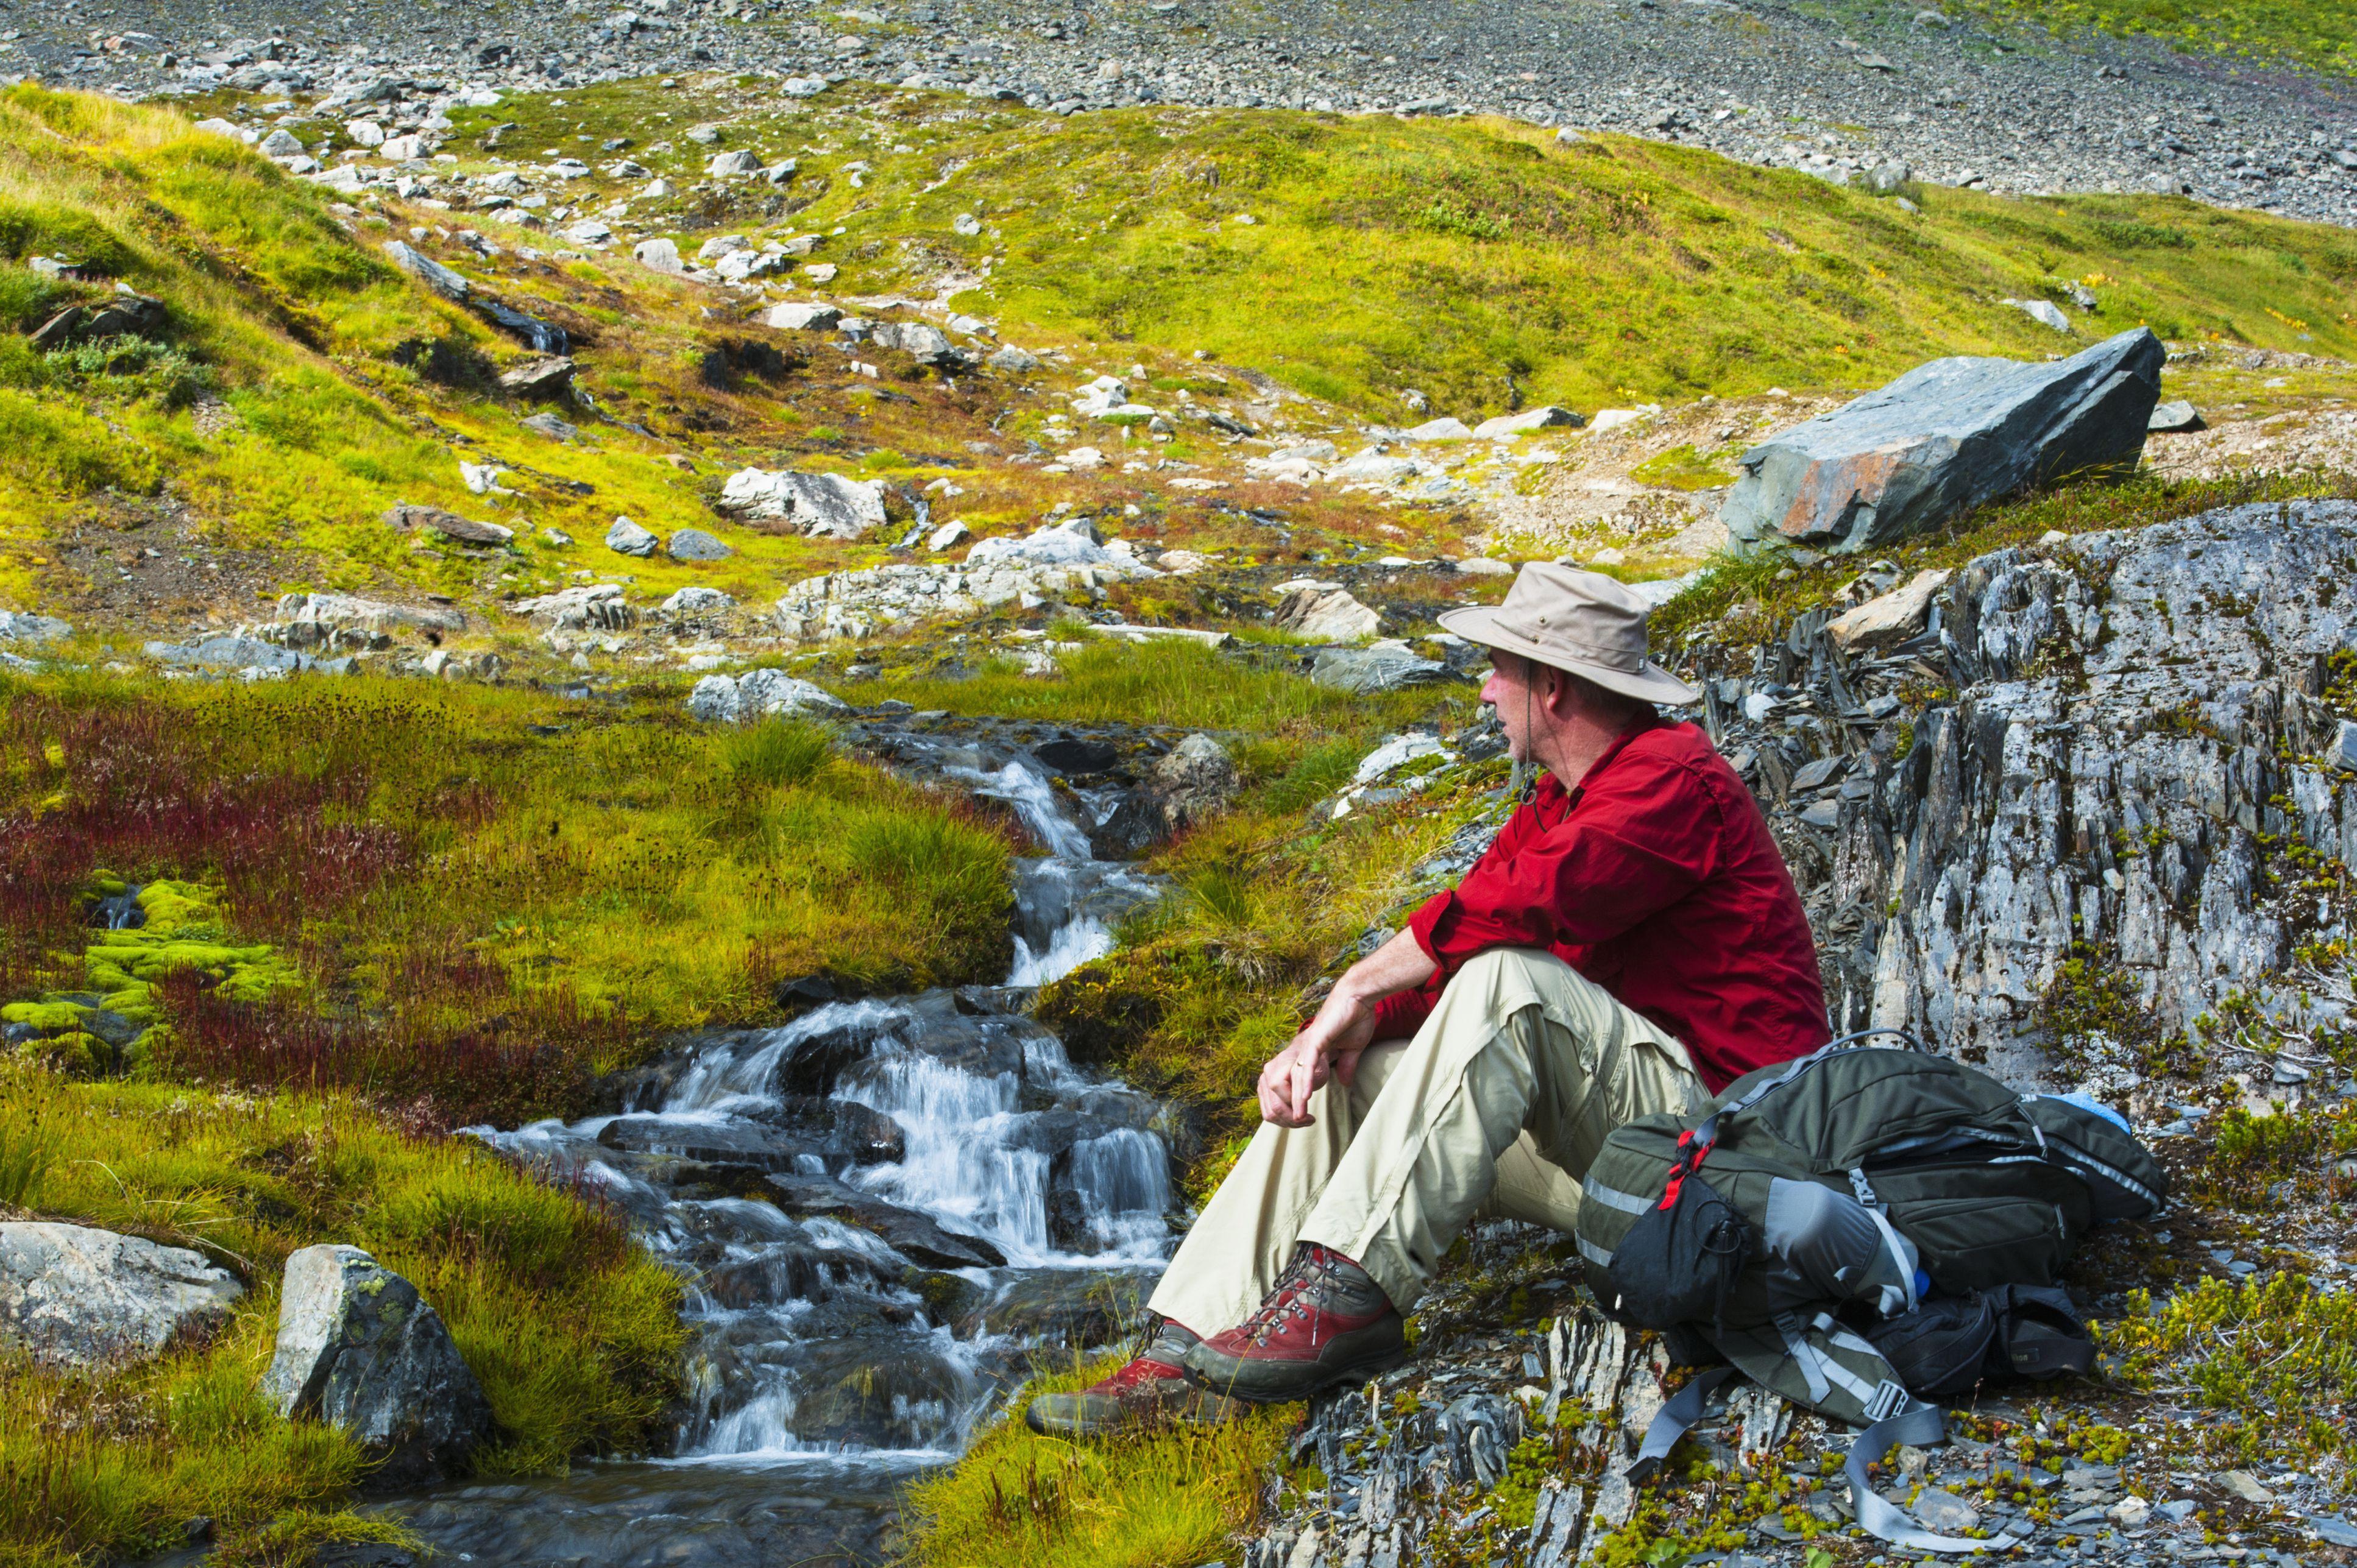 A man sitting next to a stream, Kenai Fjords National Park, Kenai Penninsula, Southcentral Alaska